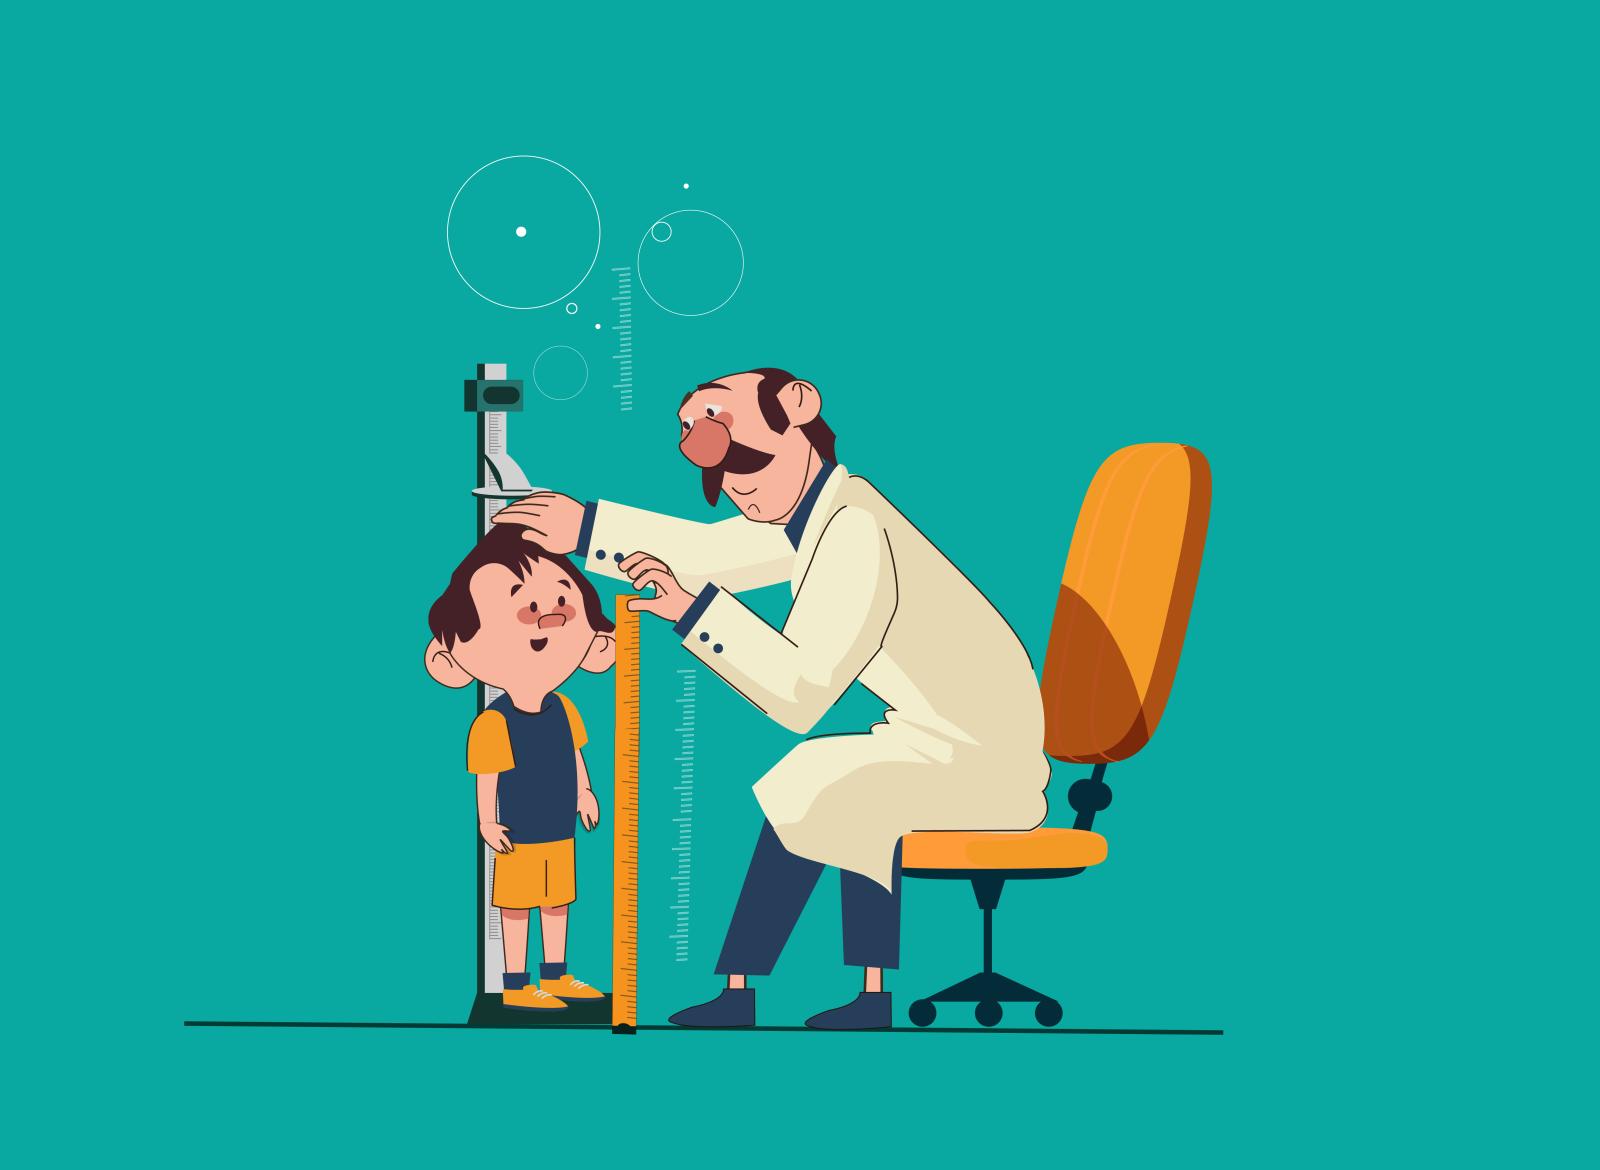 Pediatrician doctor in 2020 Pediatrician, Doctor, Character